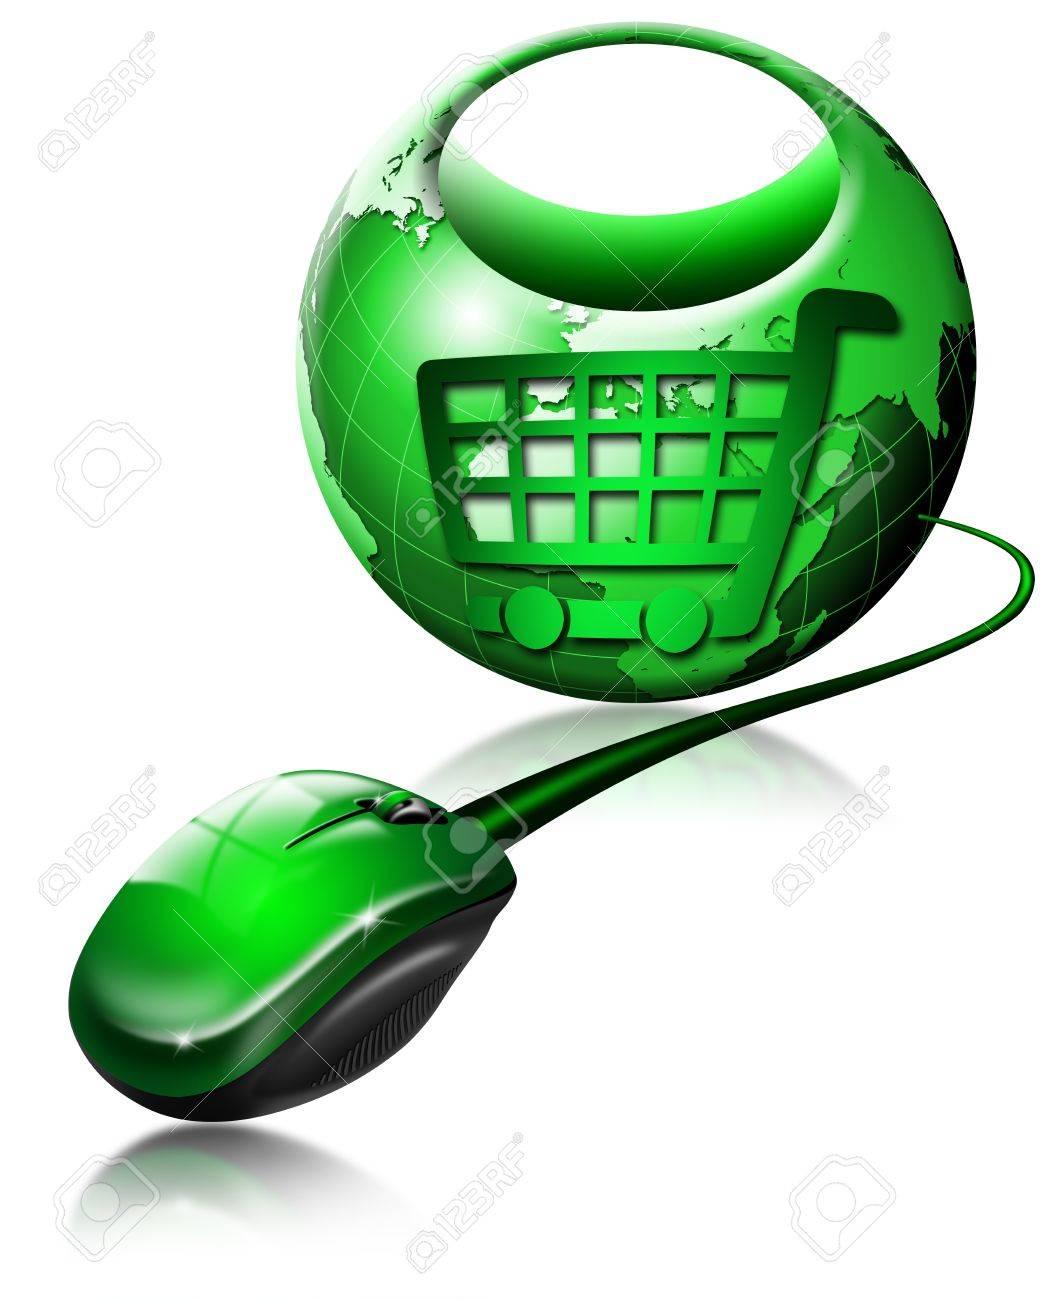 Mouse and globe shaped shopping bag, symbol of shopping Stock Photo - 9918039